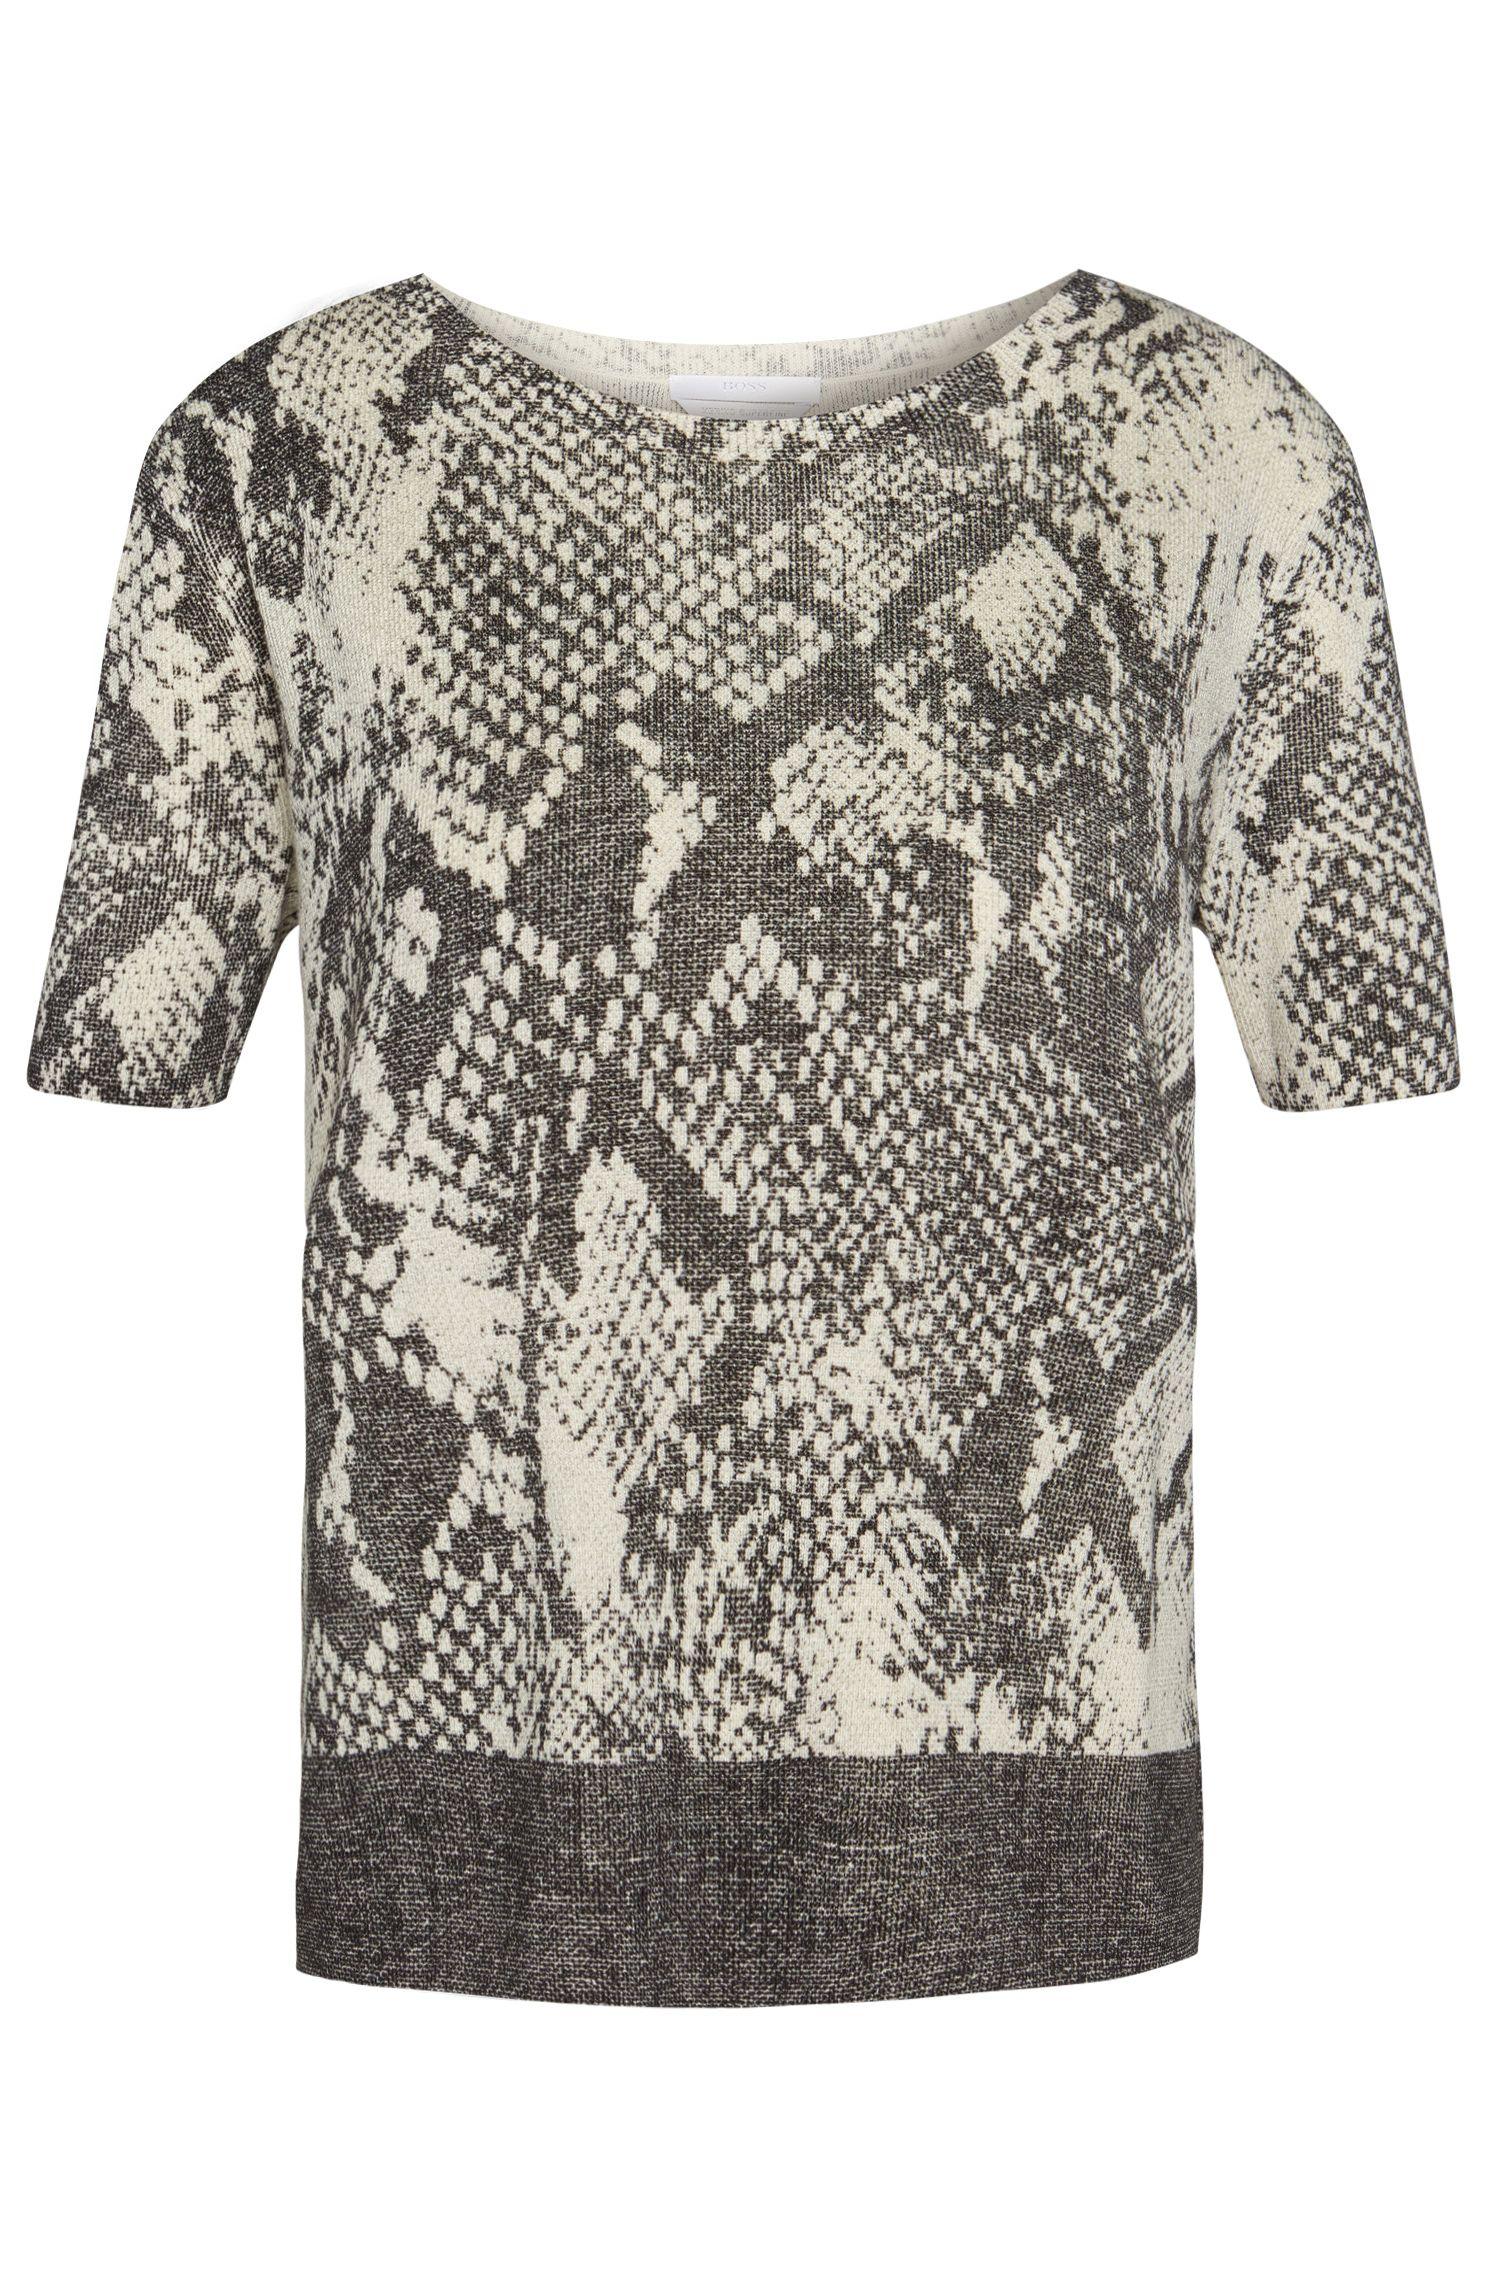 Jersey de manga corta en lana virgen suave con estampado animal: 'Fakiri'